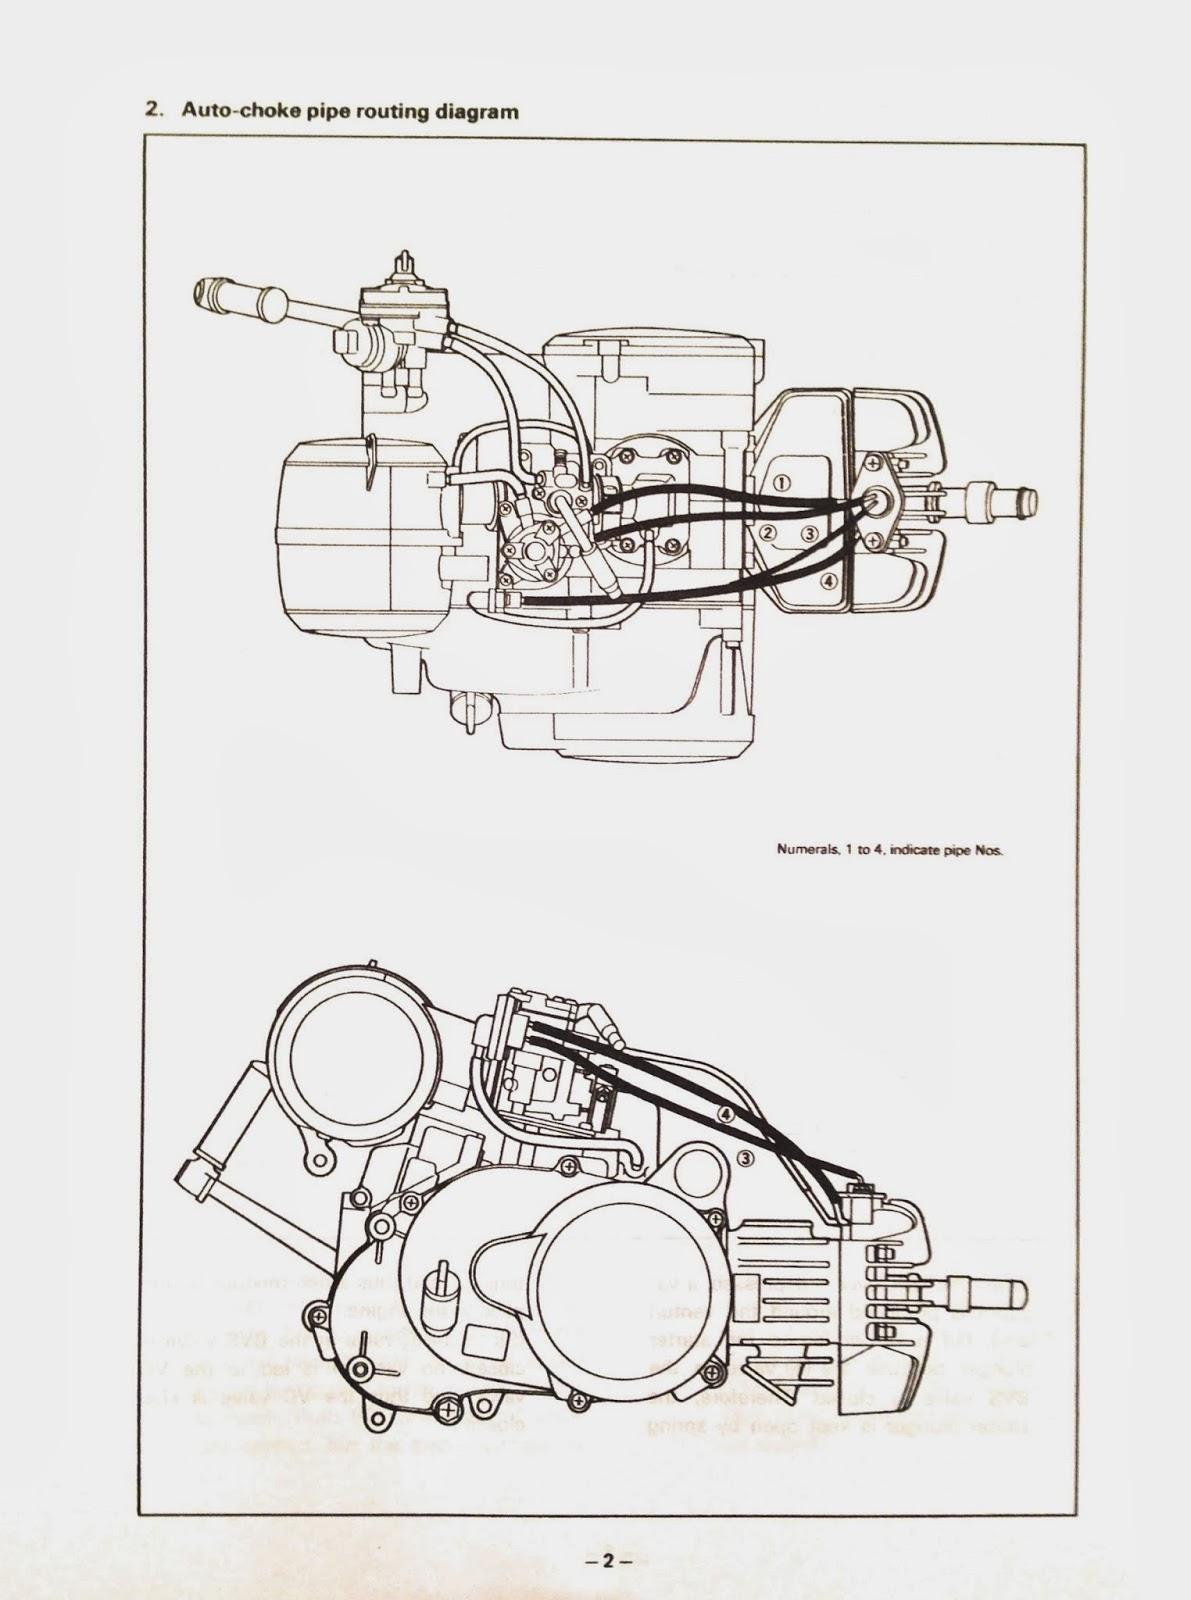 lc 50 service manual in jpg format [ 1191 x 1600 Pixel ]